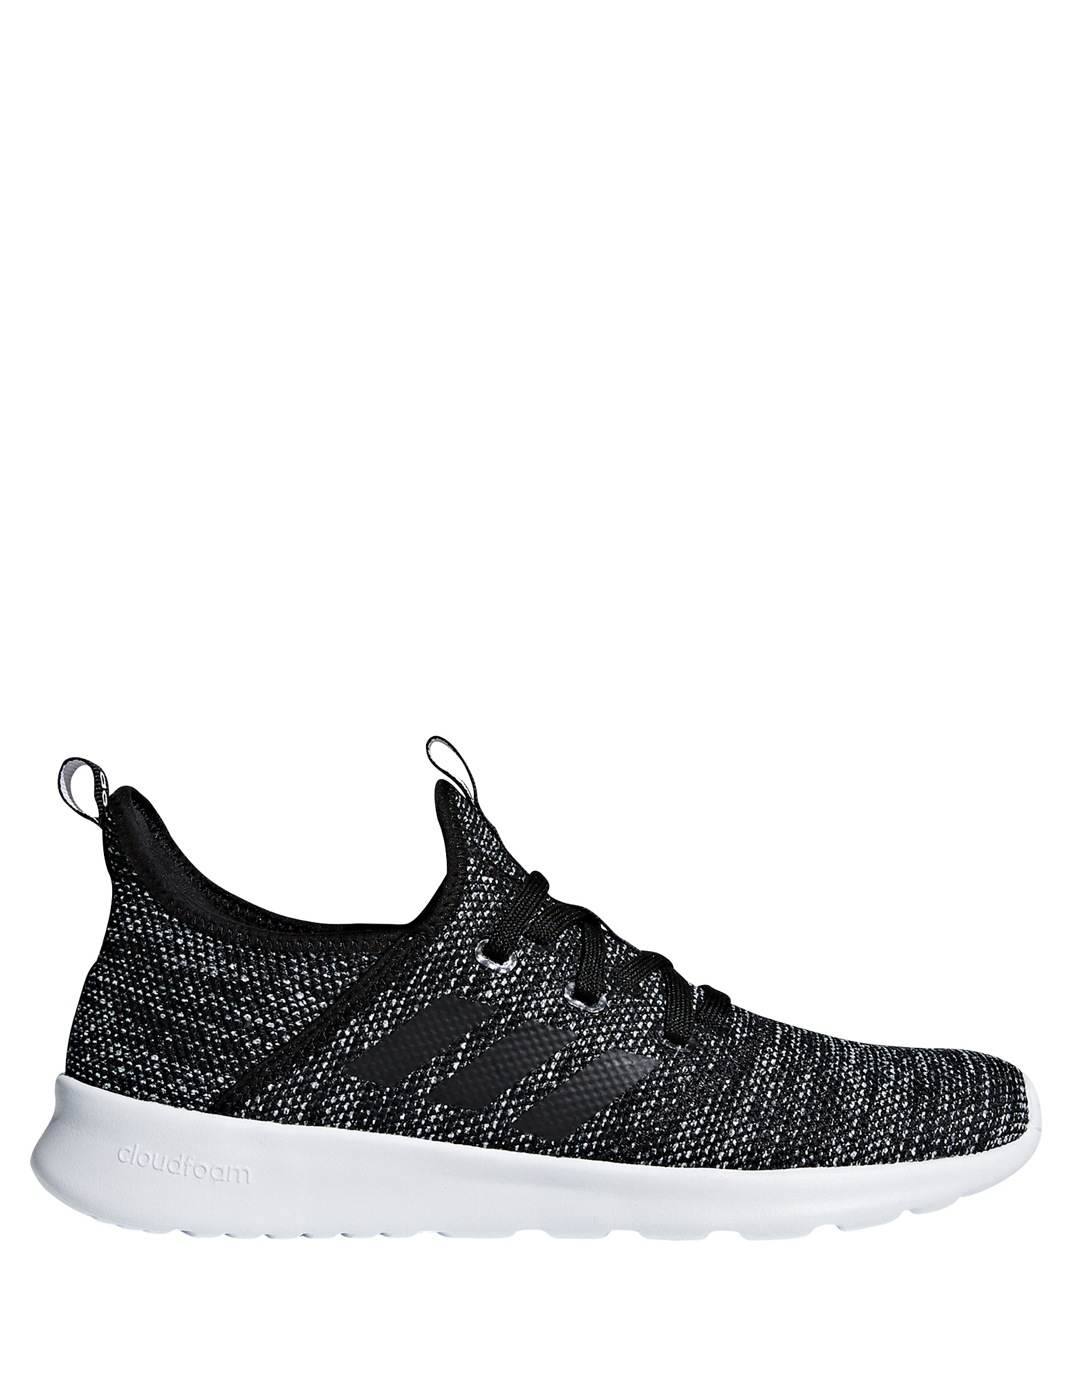 Adidas cloudfoam puro db0694 Myer online